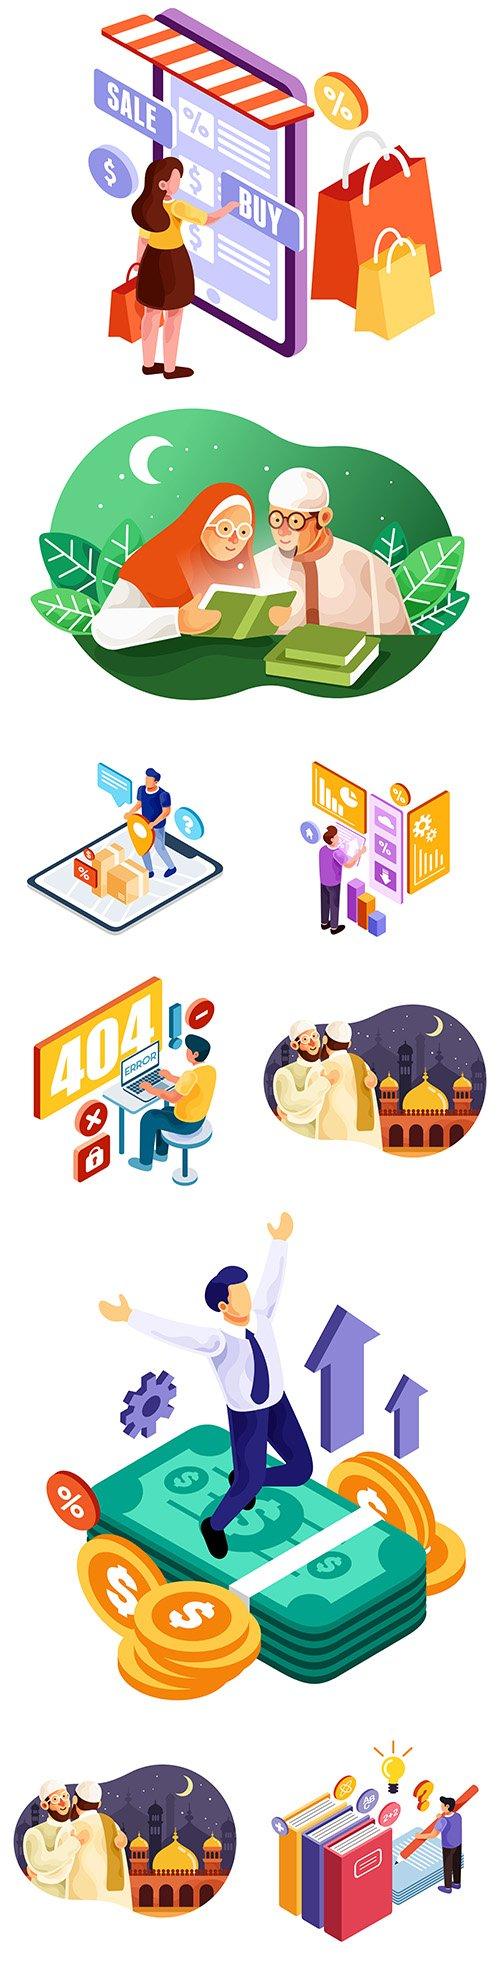 People communicate online isometric illustrations